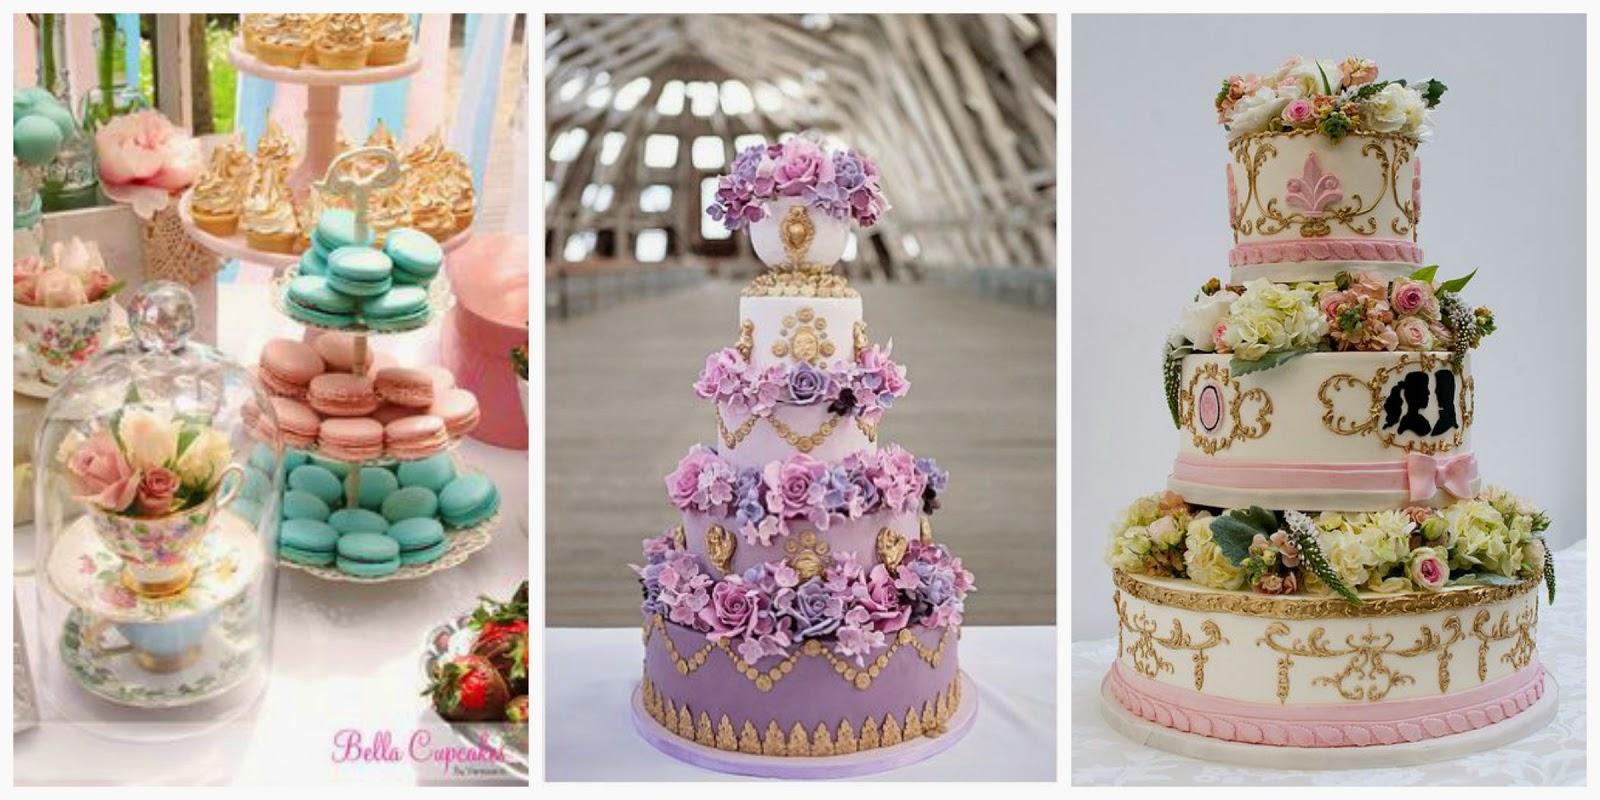 tarta boda macarons boda barroca blog mi boda gratis